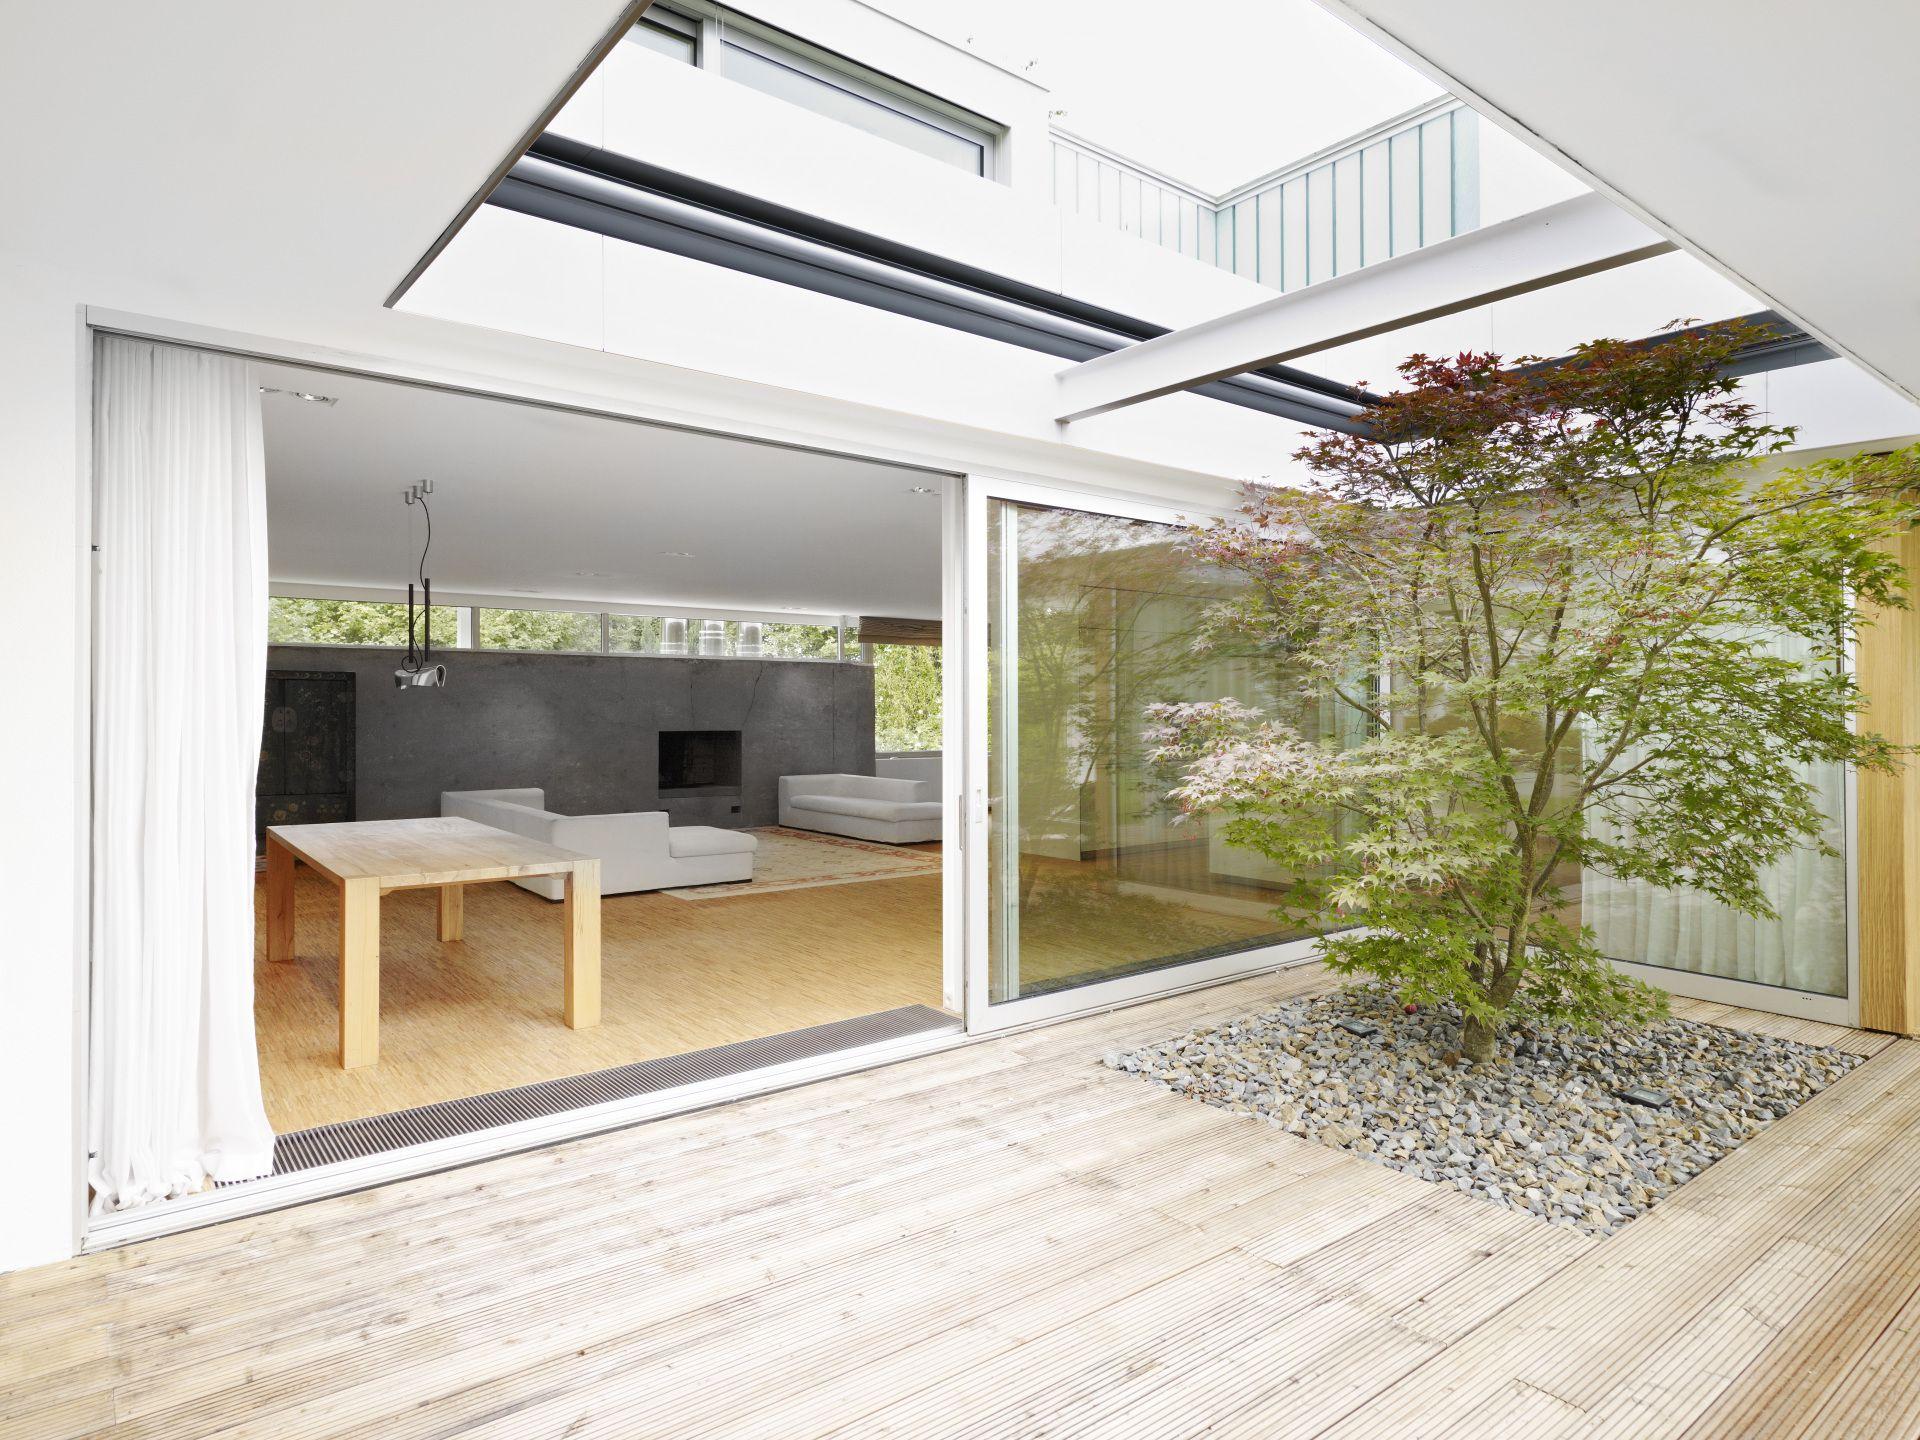 atrium terrasse mit offenem dach. Black Bedroom Furniture Sets. Home Design Ideas